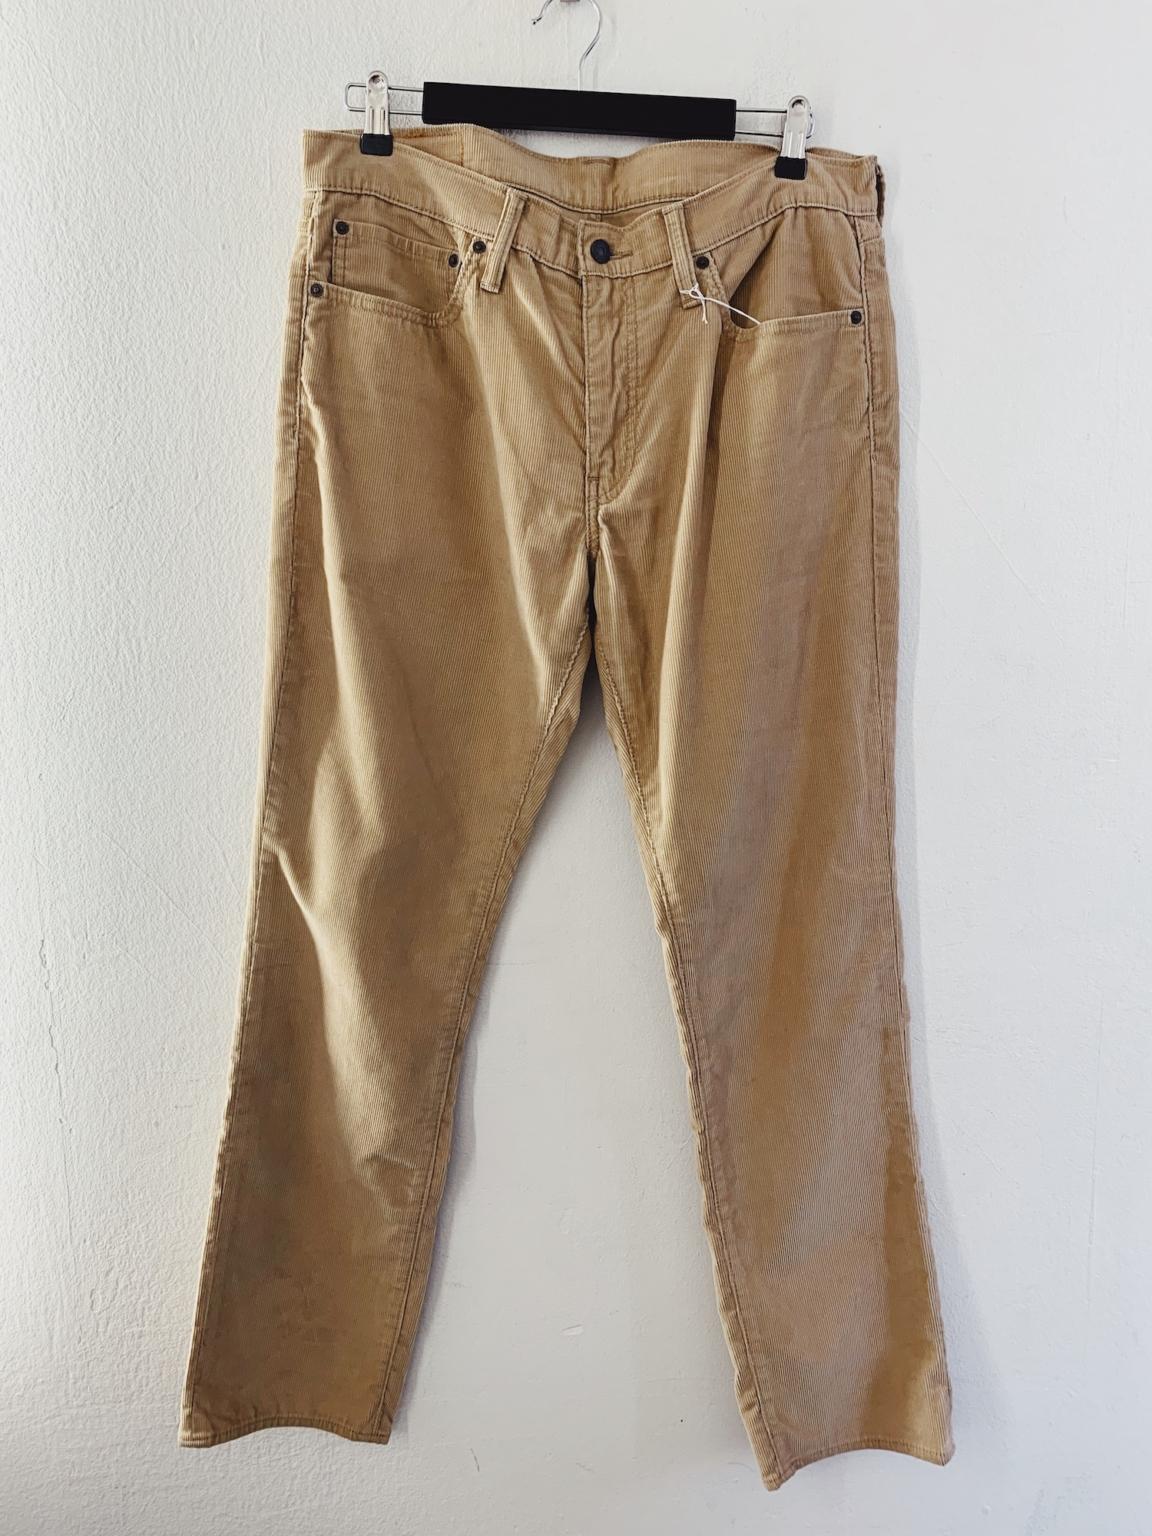 Ecosphere Vintage - Levi's Corduroy Pants